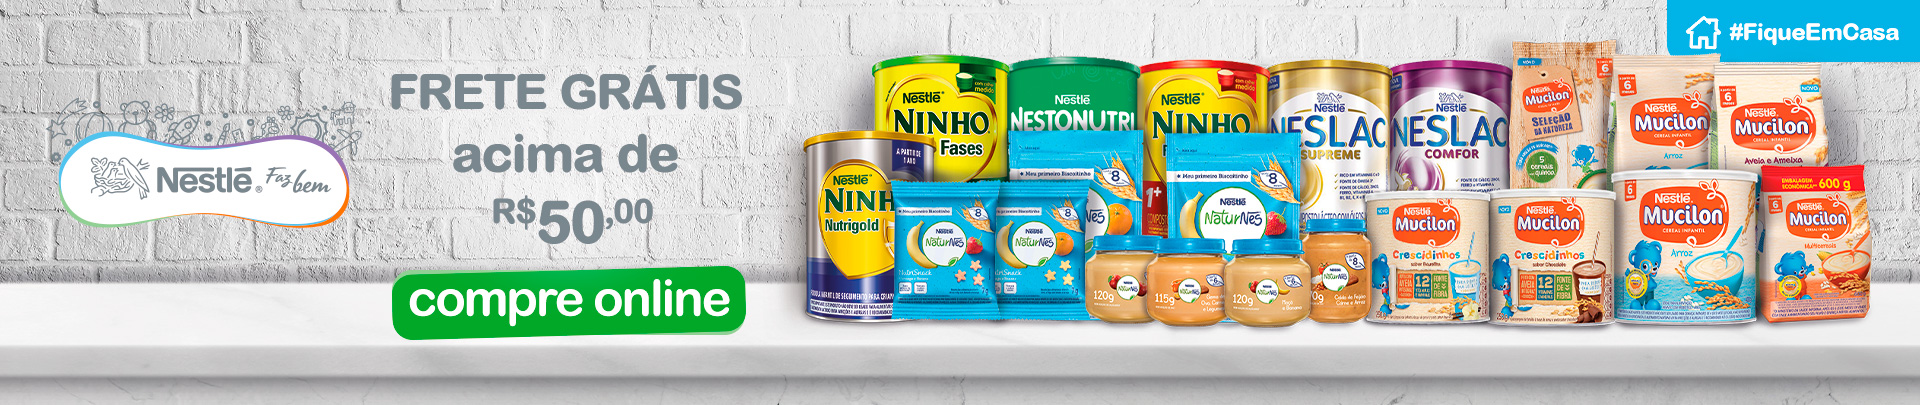 Nestle Frete Gratis